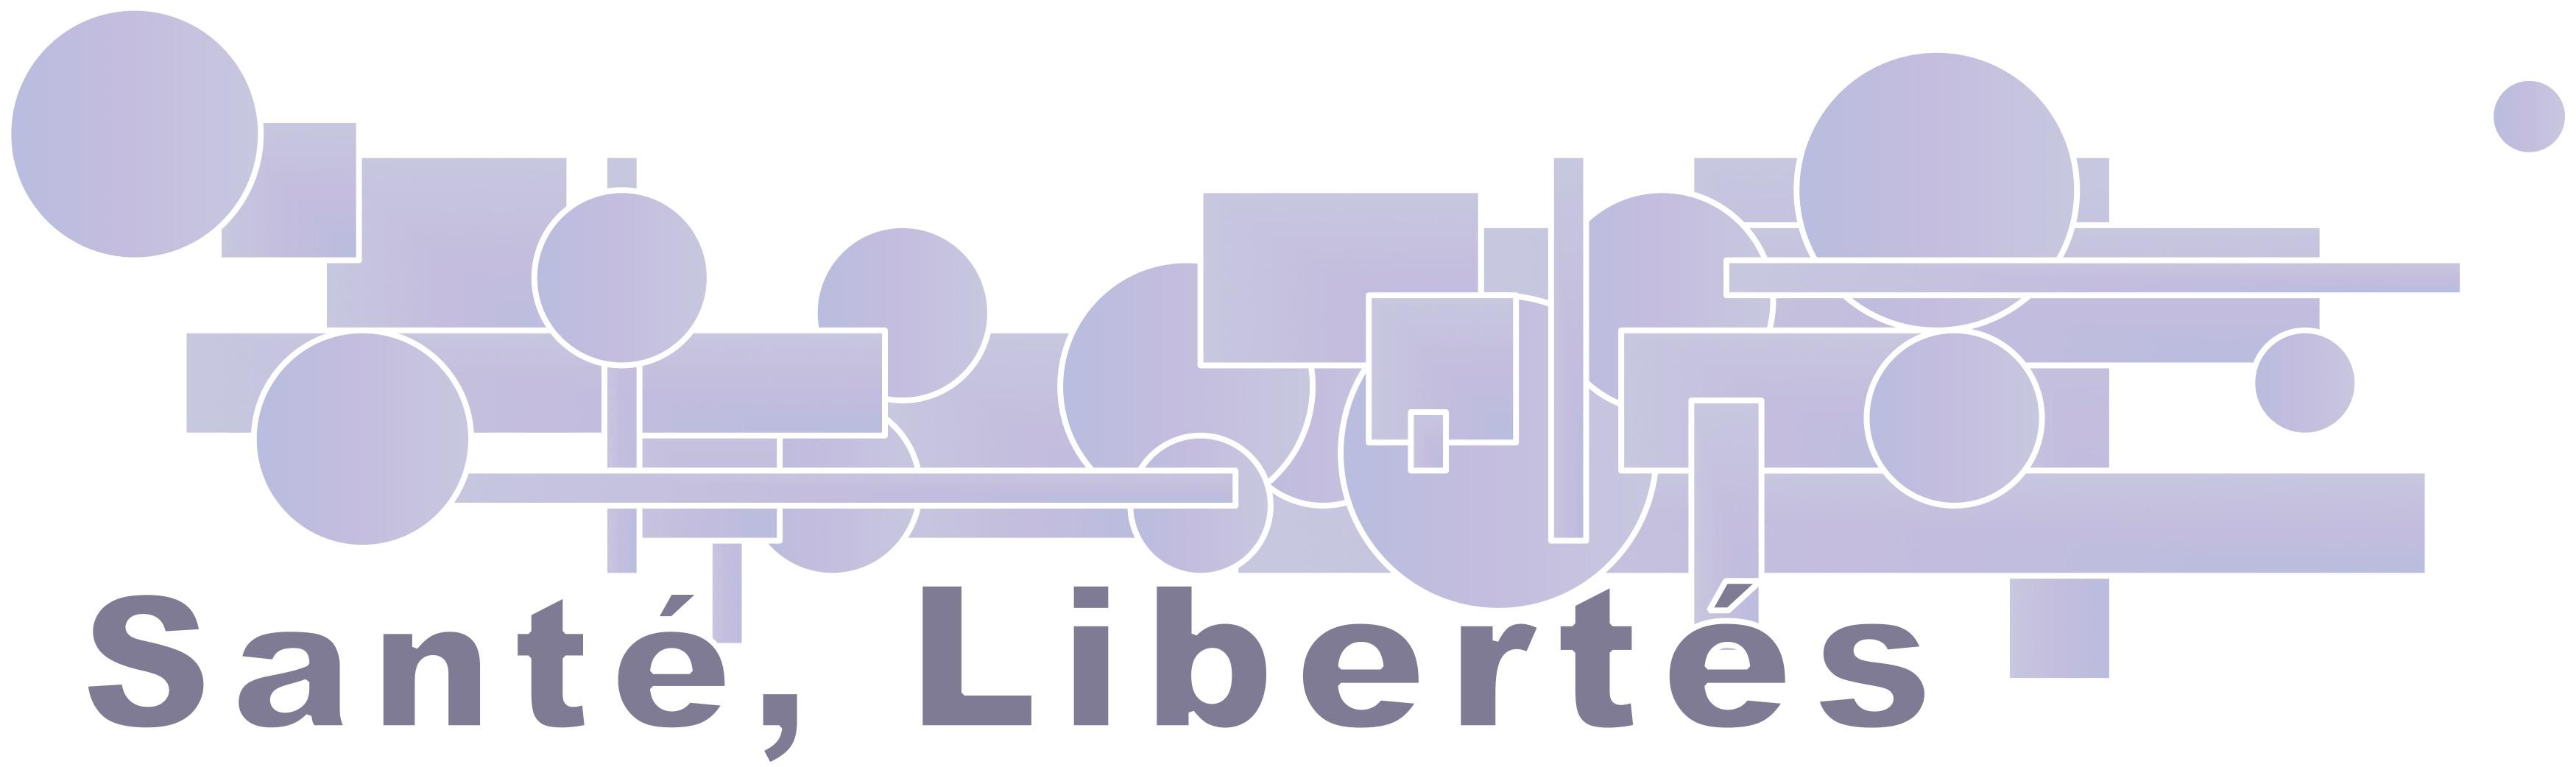 Santé, Libertés